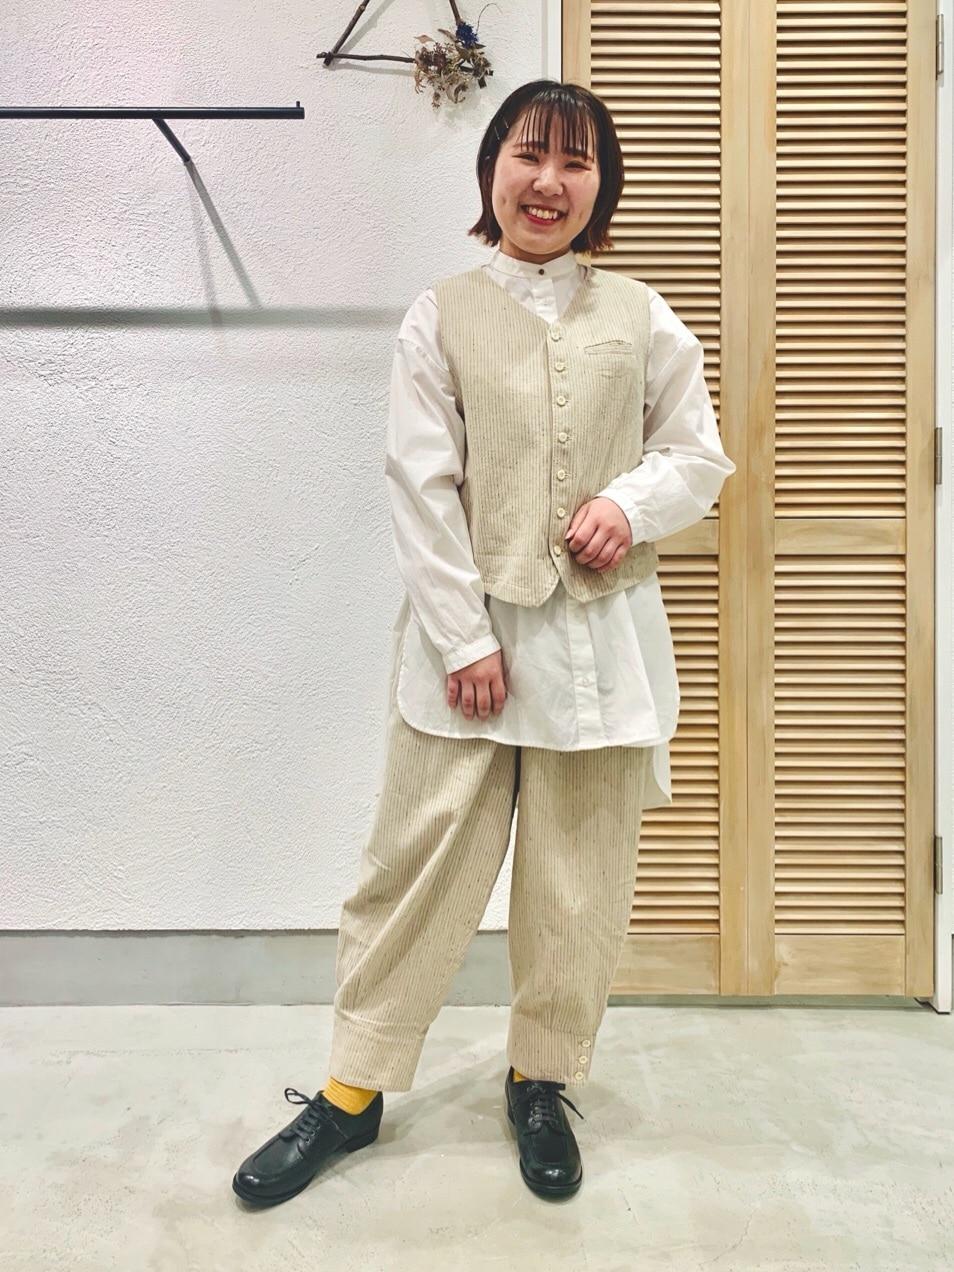 chambre de charme 横浜ジョイナス 身長:155cm 2021.01.13